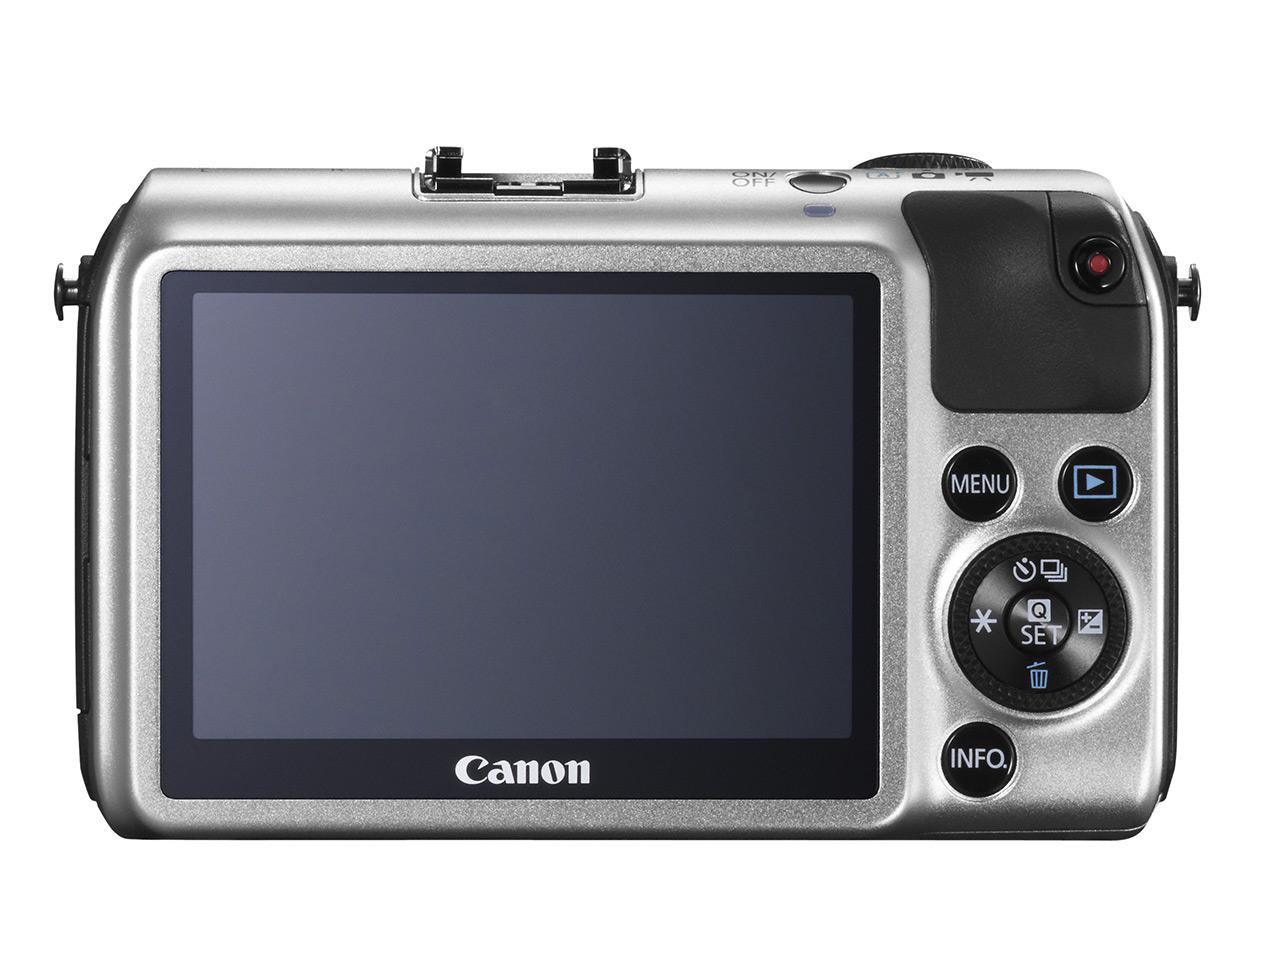 Canon EOS-M ด้านหลัง แสดงจอภาพและแผงควบคุม